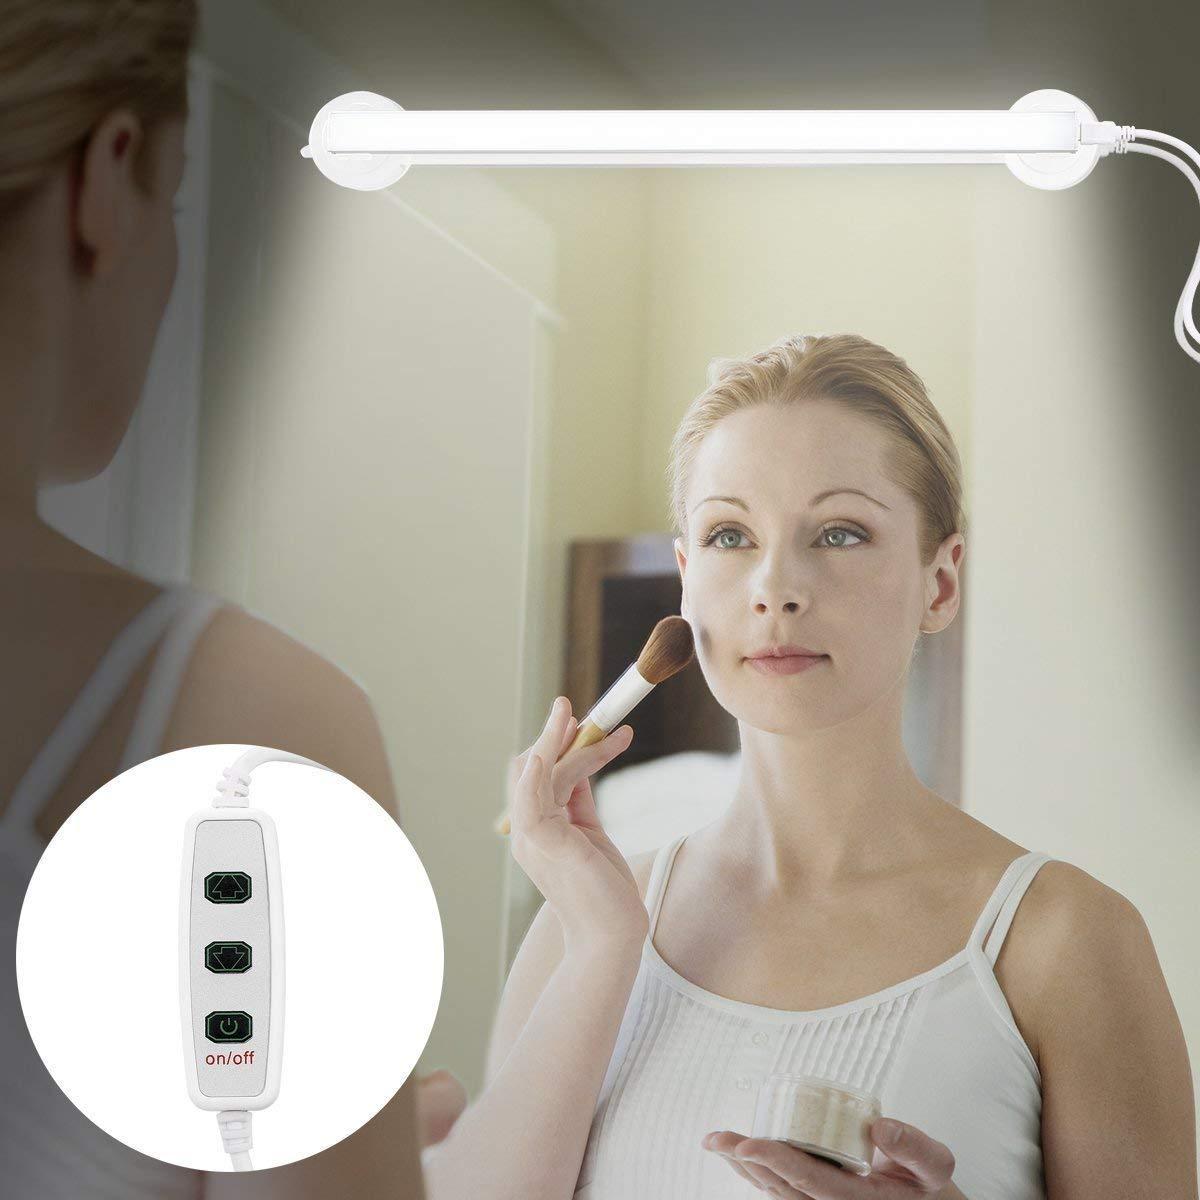 LED Vanity Mirror Light, YUJINQ Portable Vanity Light Mirror Makeup Light Bathroom Lighting Kit with Brightness Infinite Adjustable, Cable Controller, 360 Degree Rotation and USB Powered Cosmetic Lamp